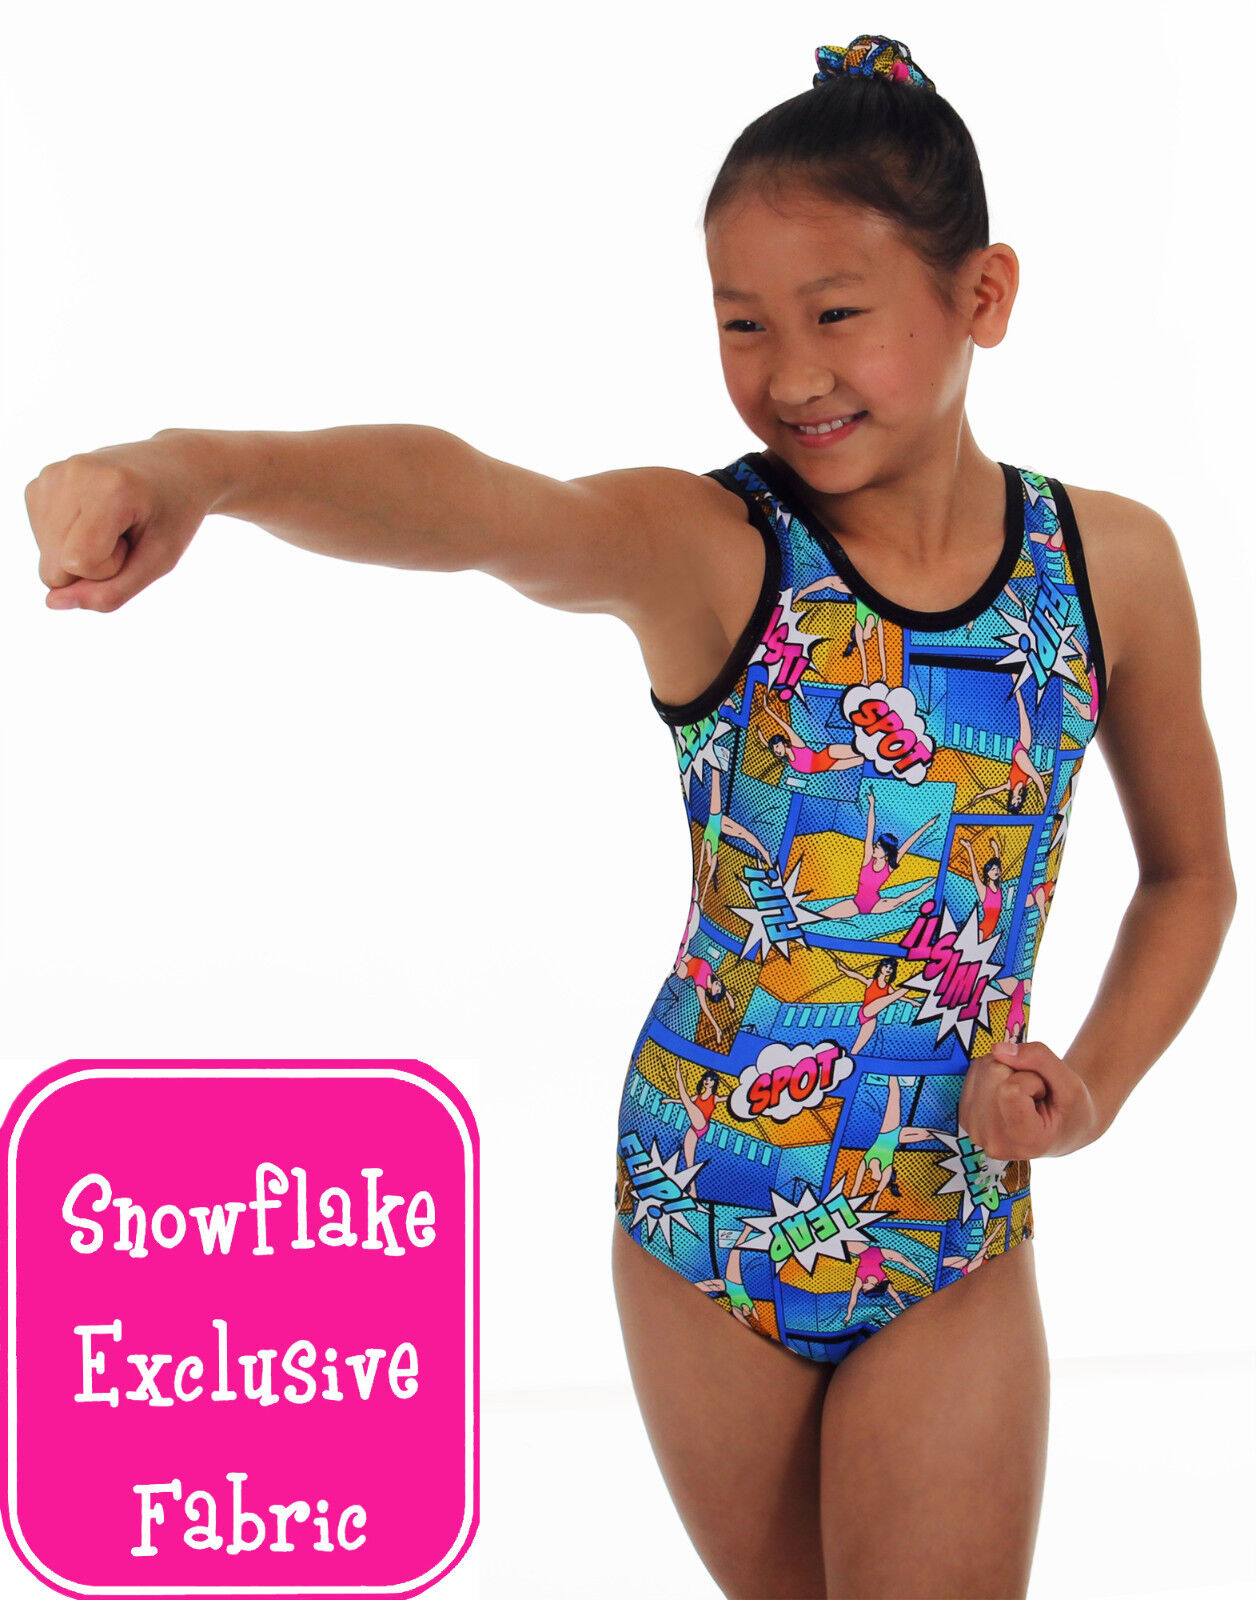 NEW  Heroic Gymnastics Leotard by Snowflake Designs